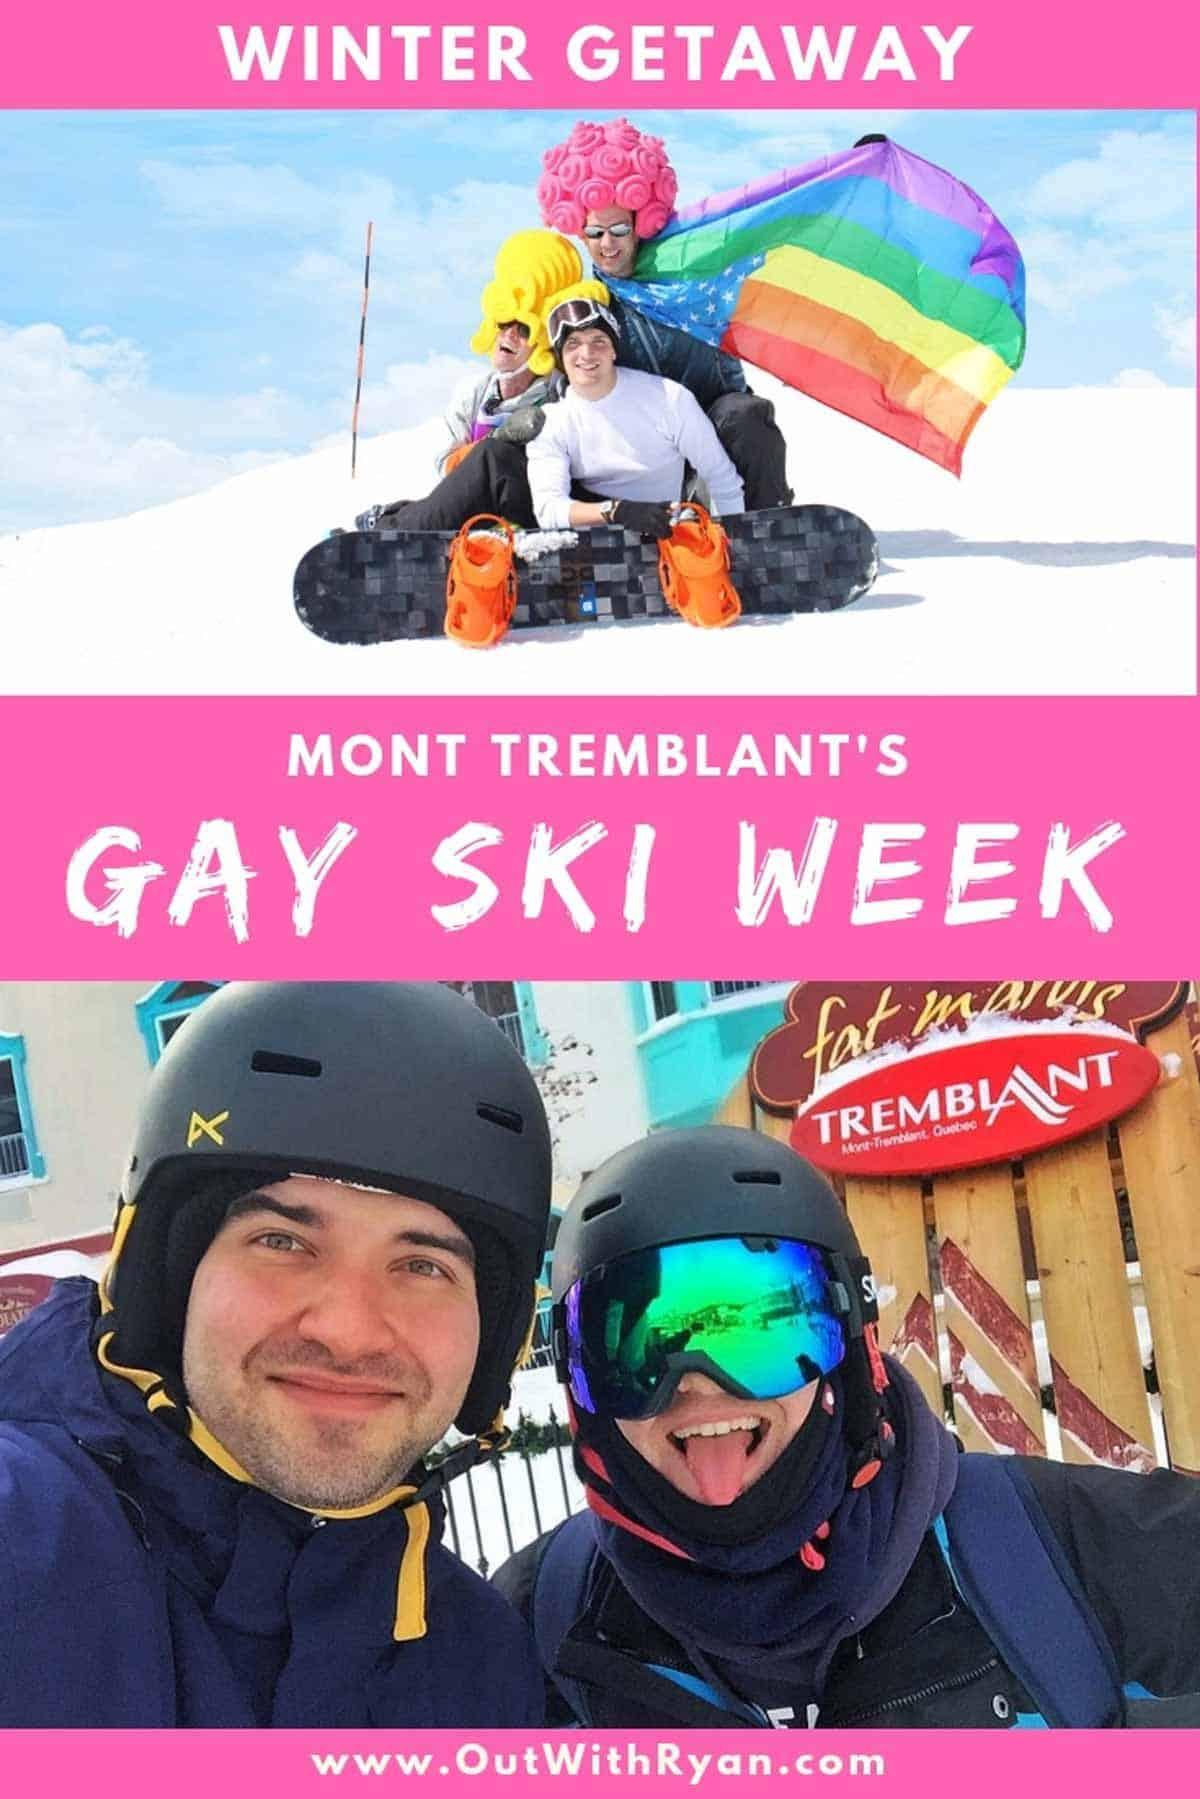 Visit-Tremblant-Gay-Ski-Week-&-Gay-Mont-Tremblant